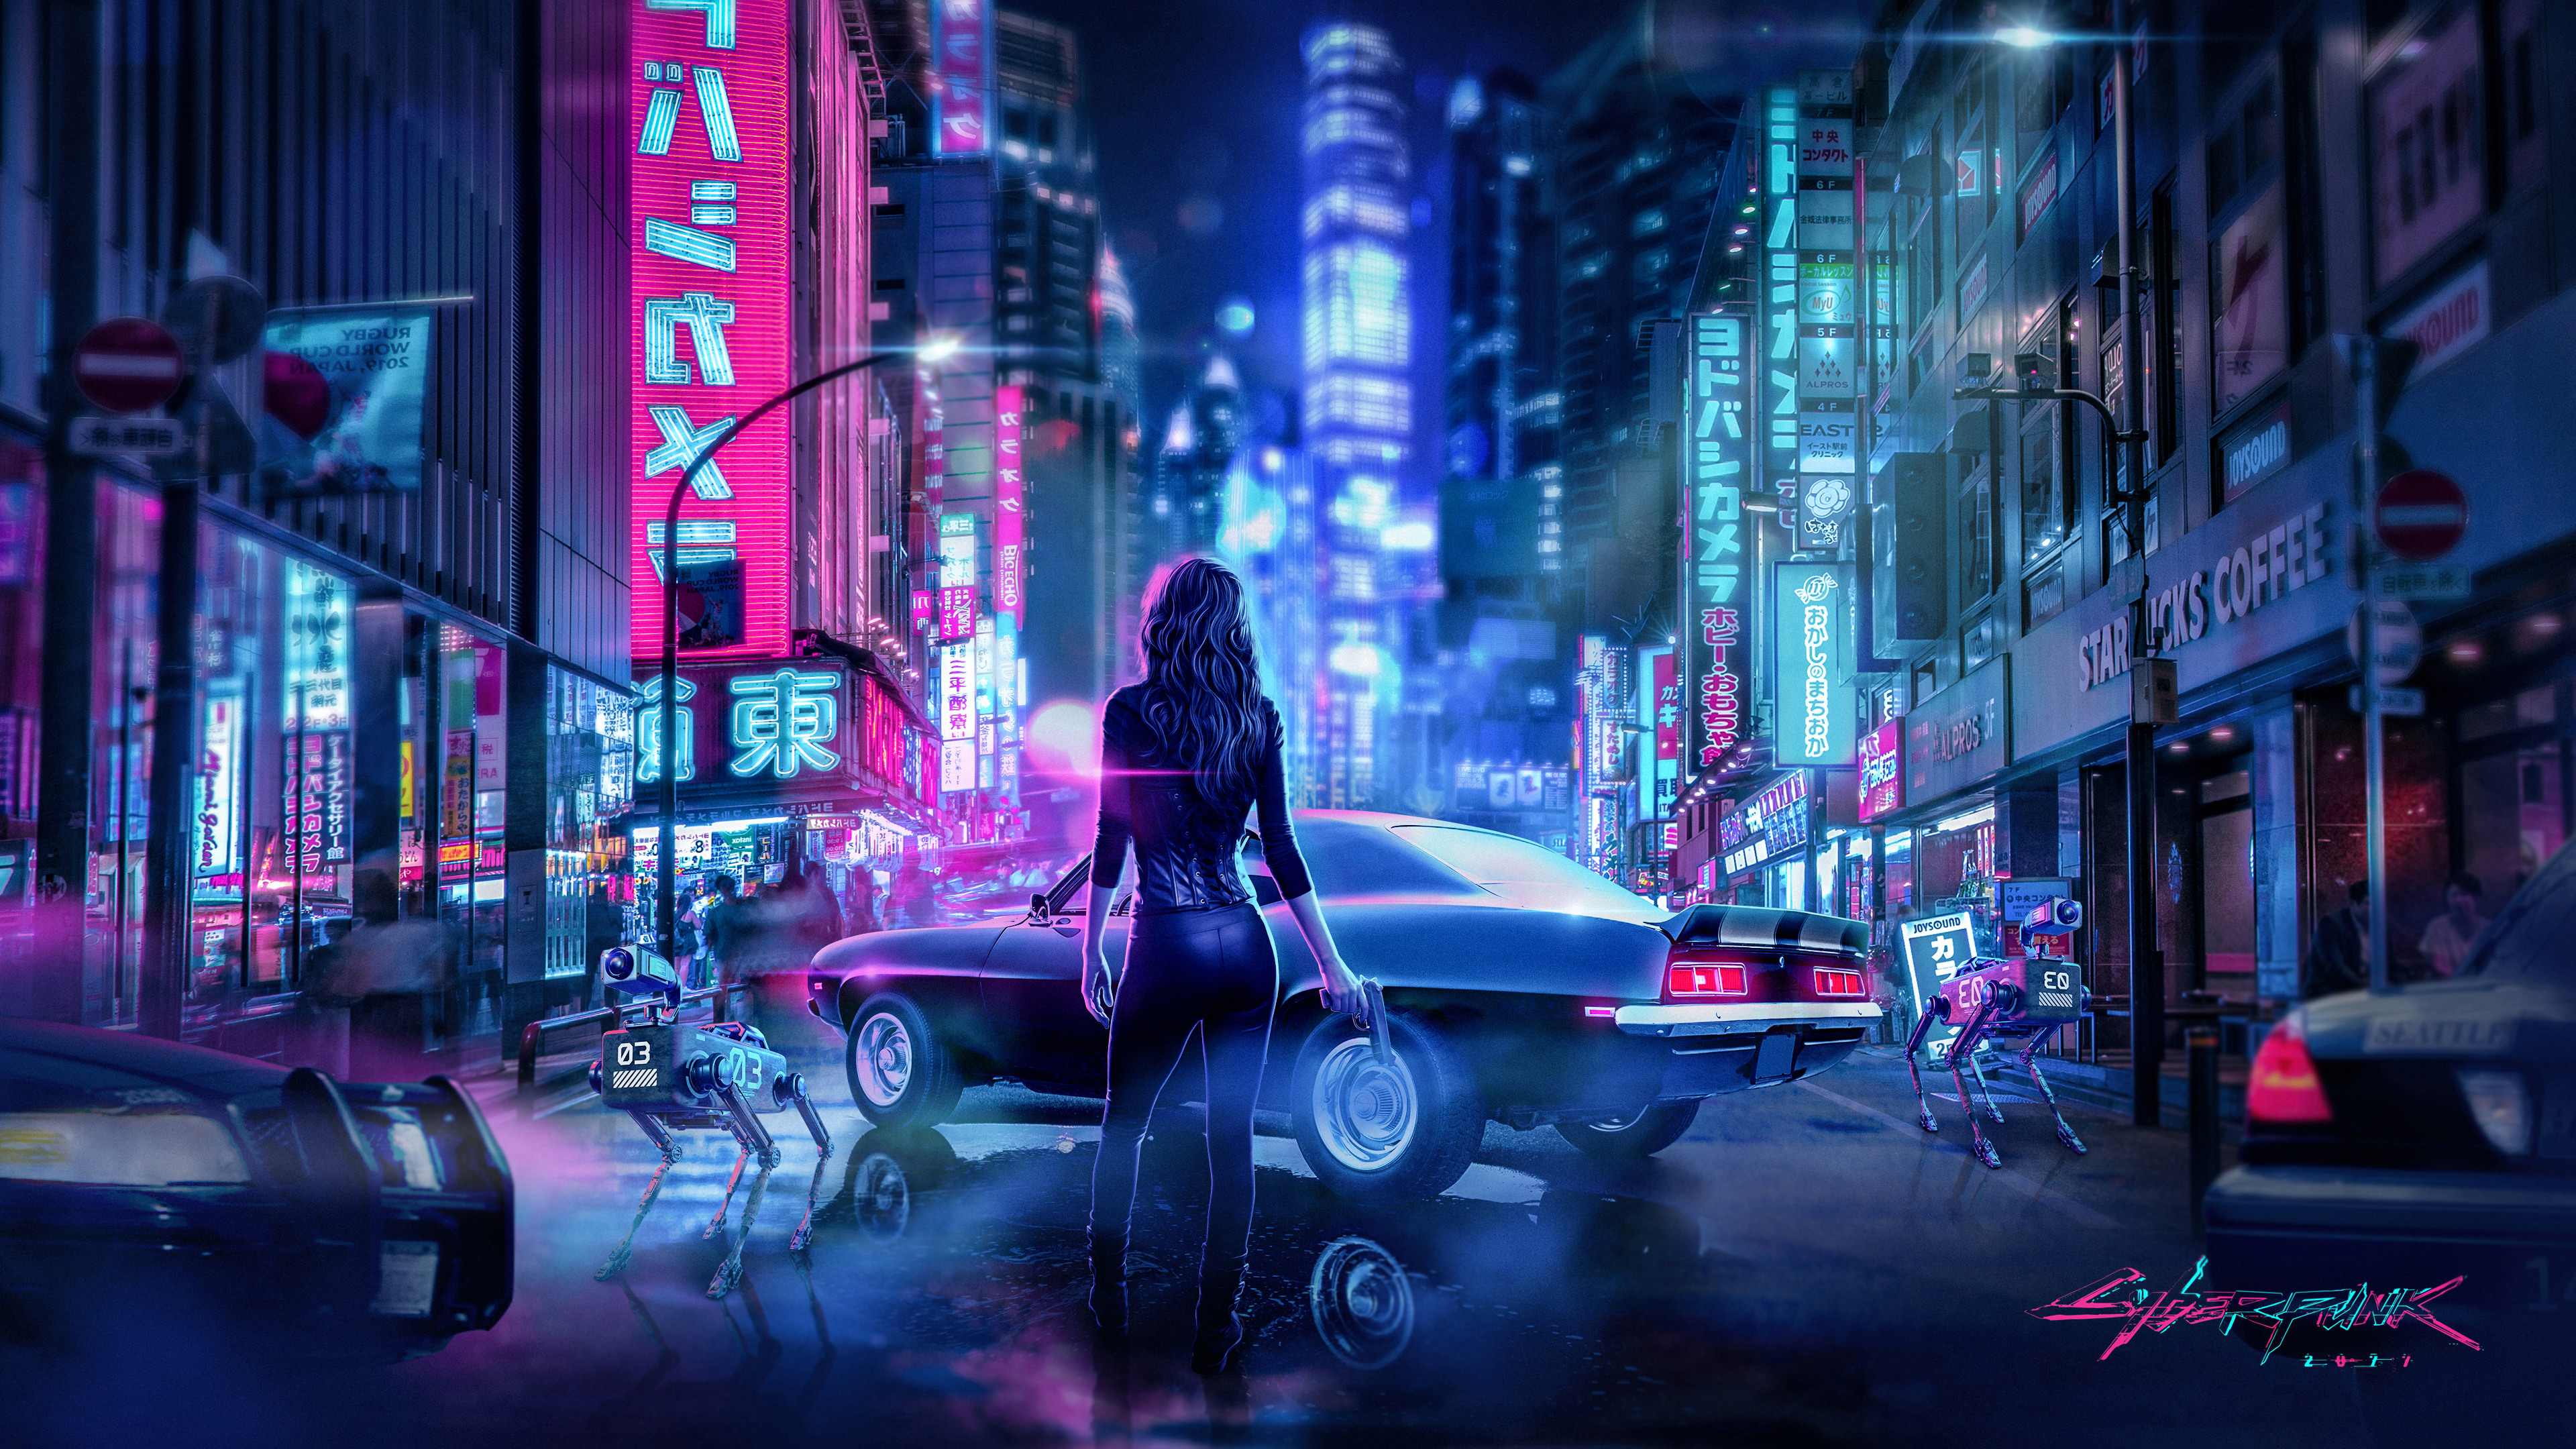 Cyberpunk2077 Wallpaper 4k 3840x2160 By Jivostudio On Deviantart